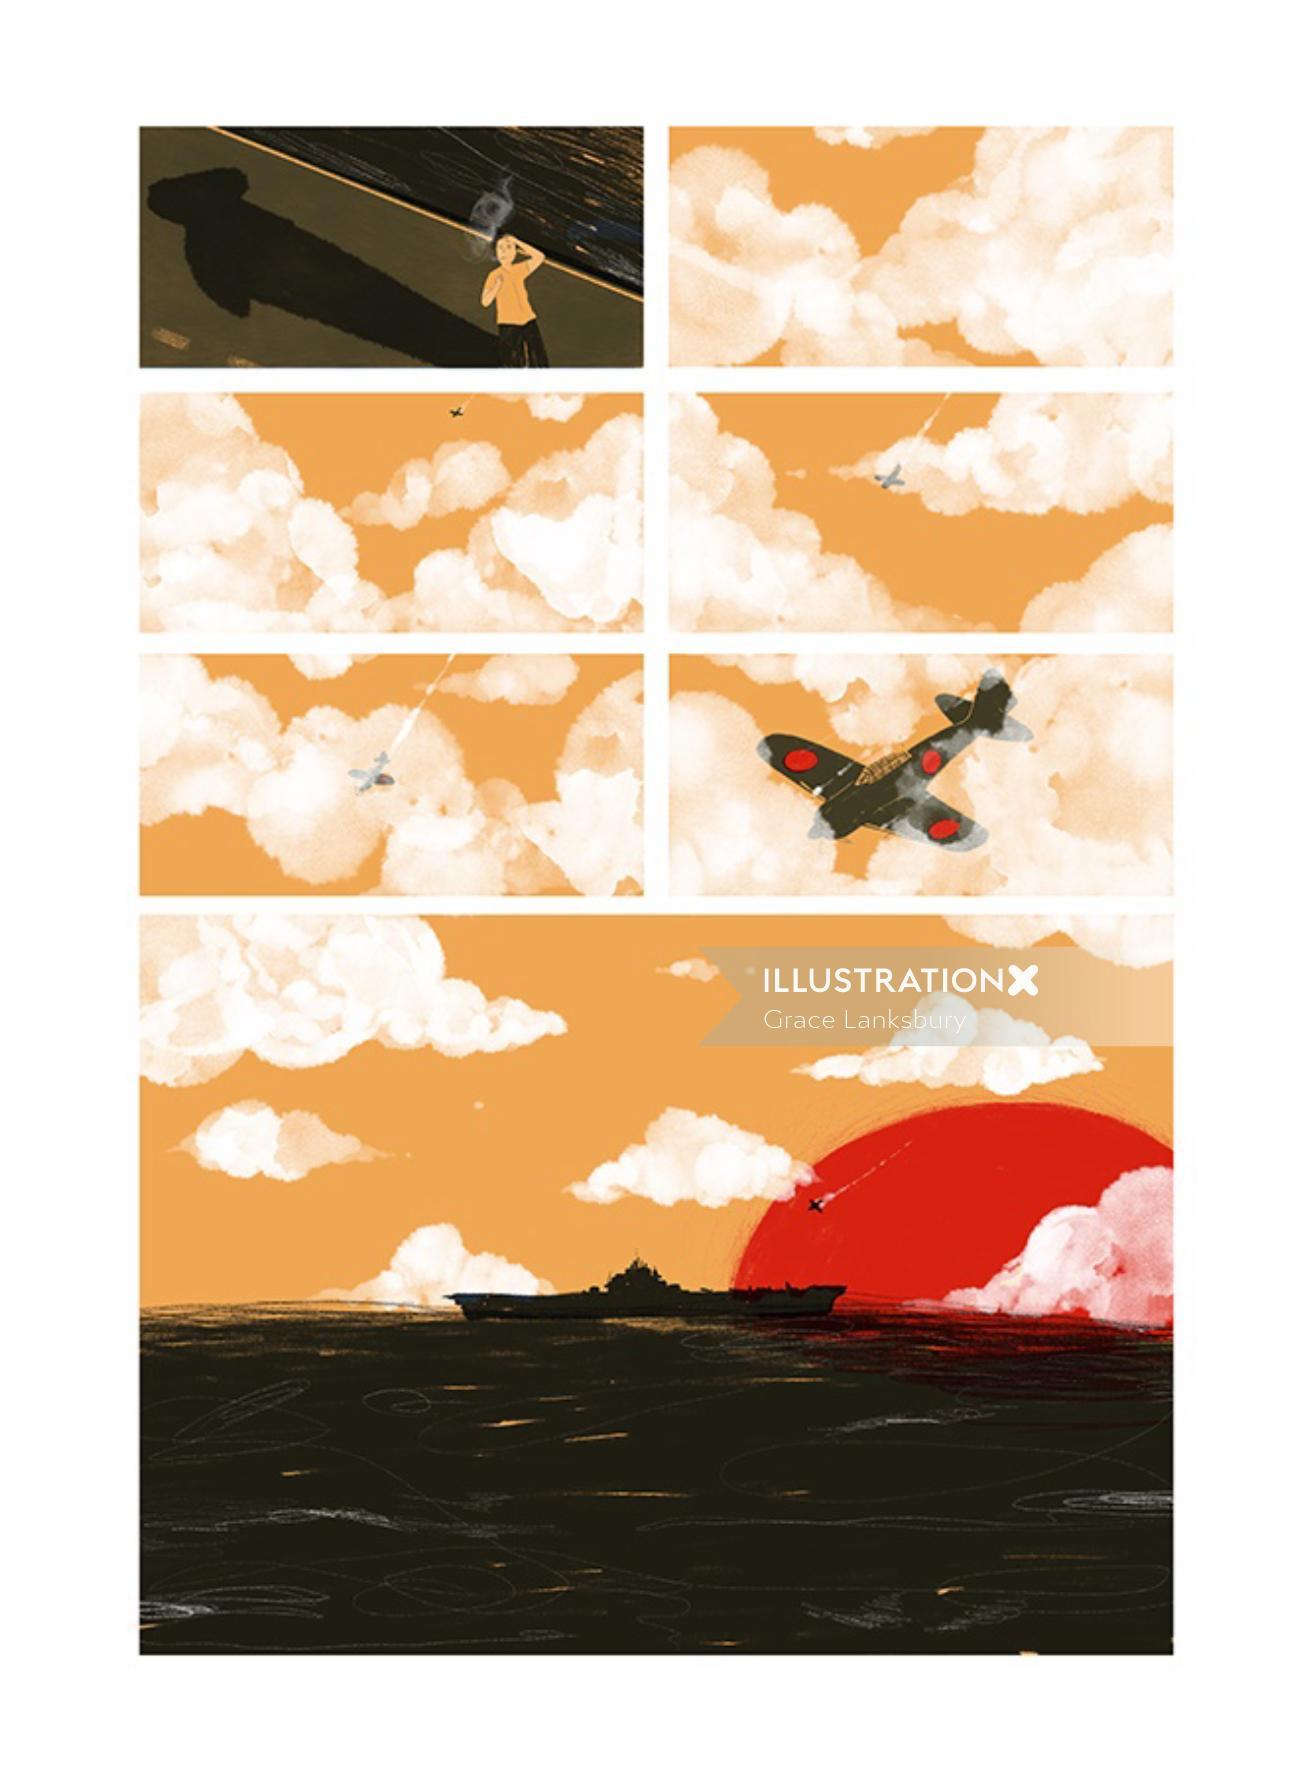 Storyboard illustration of flight crash